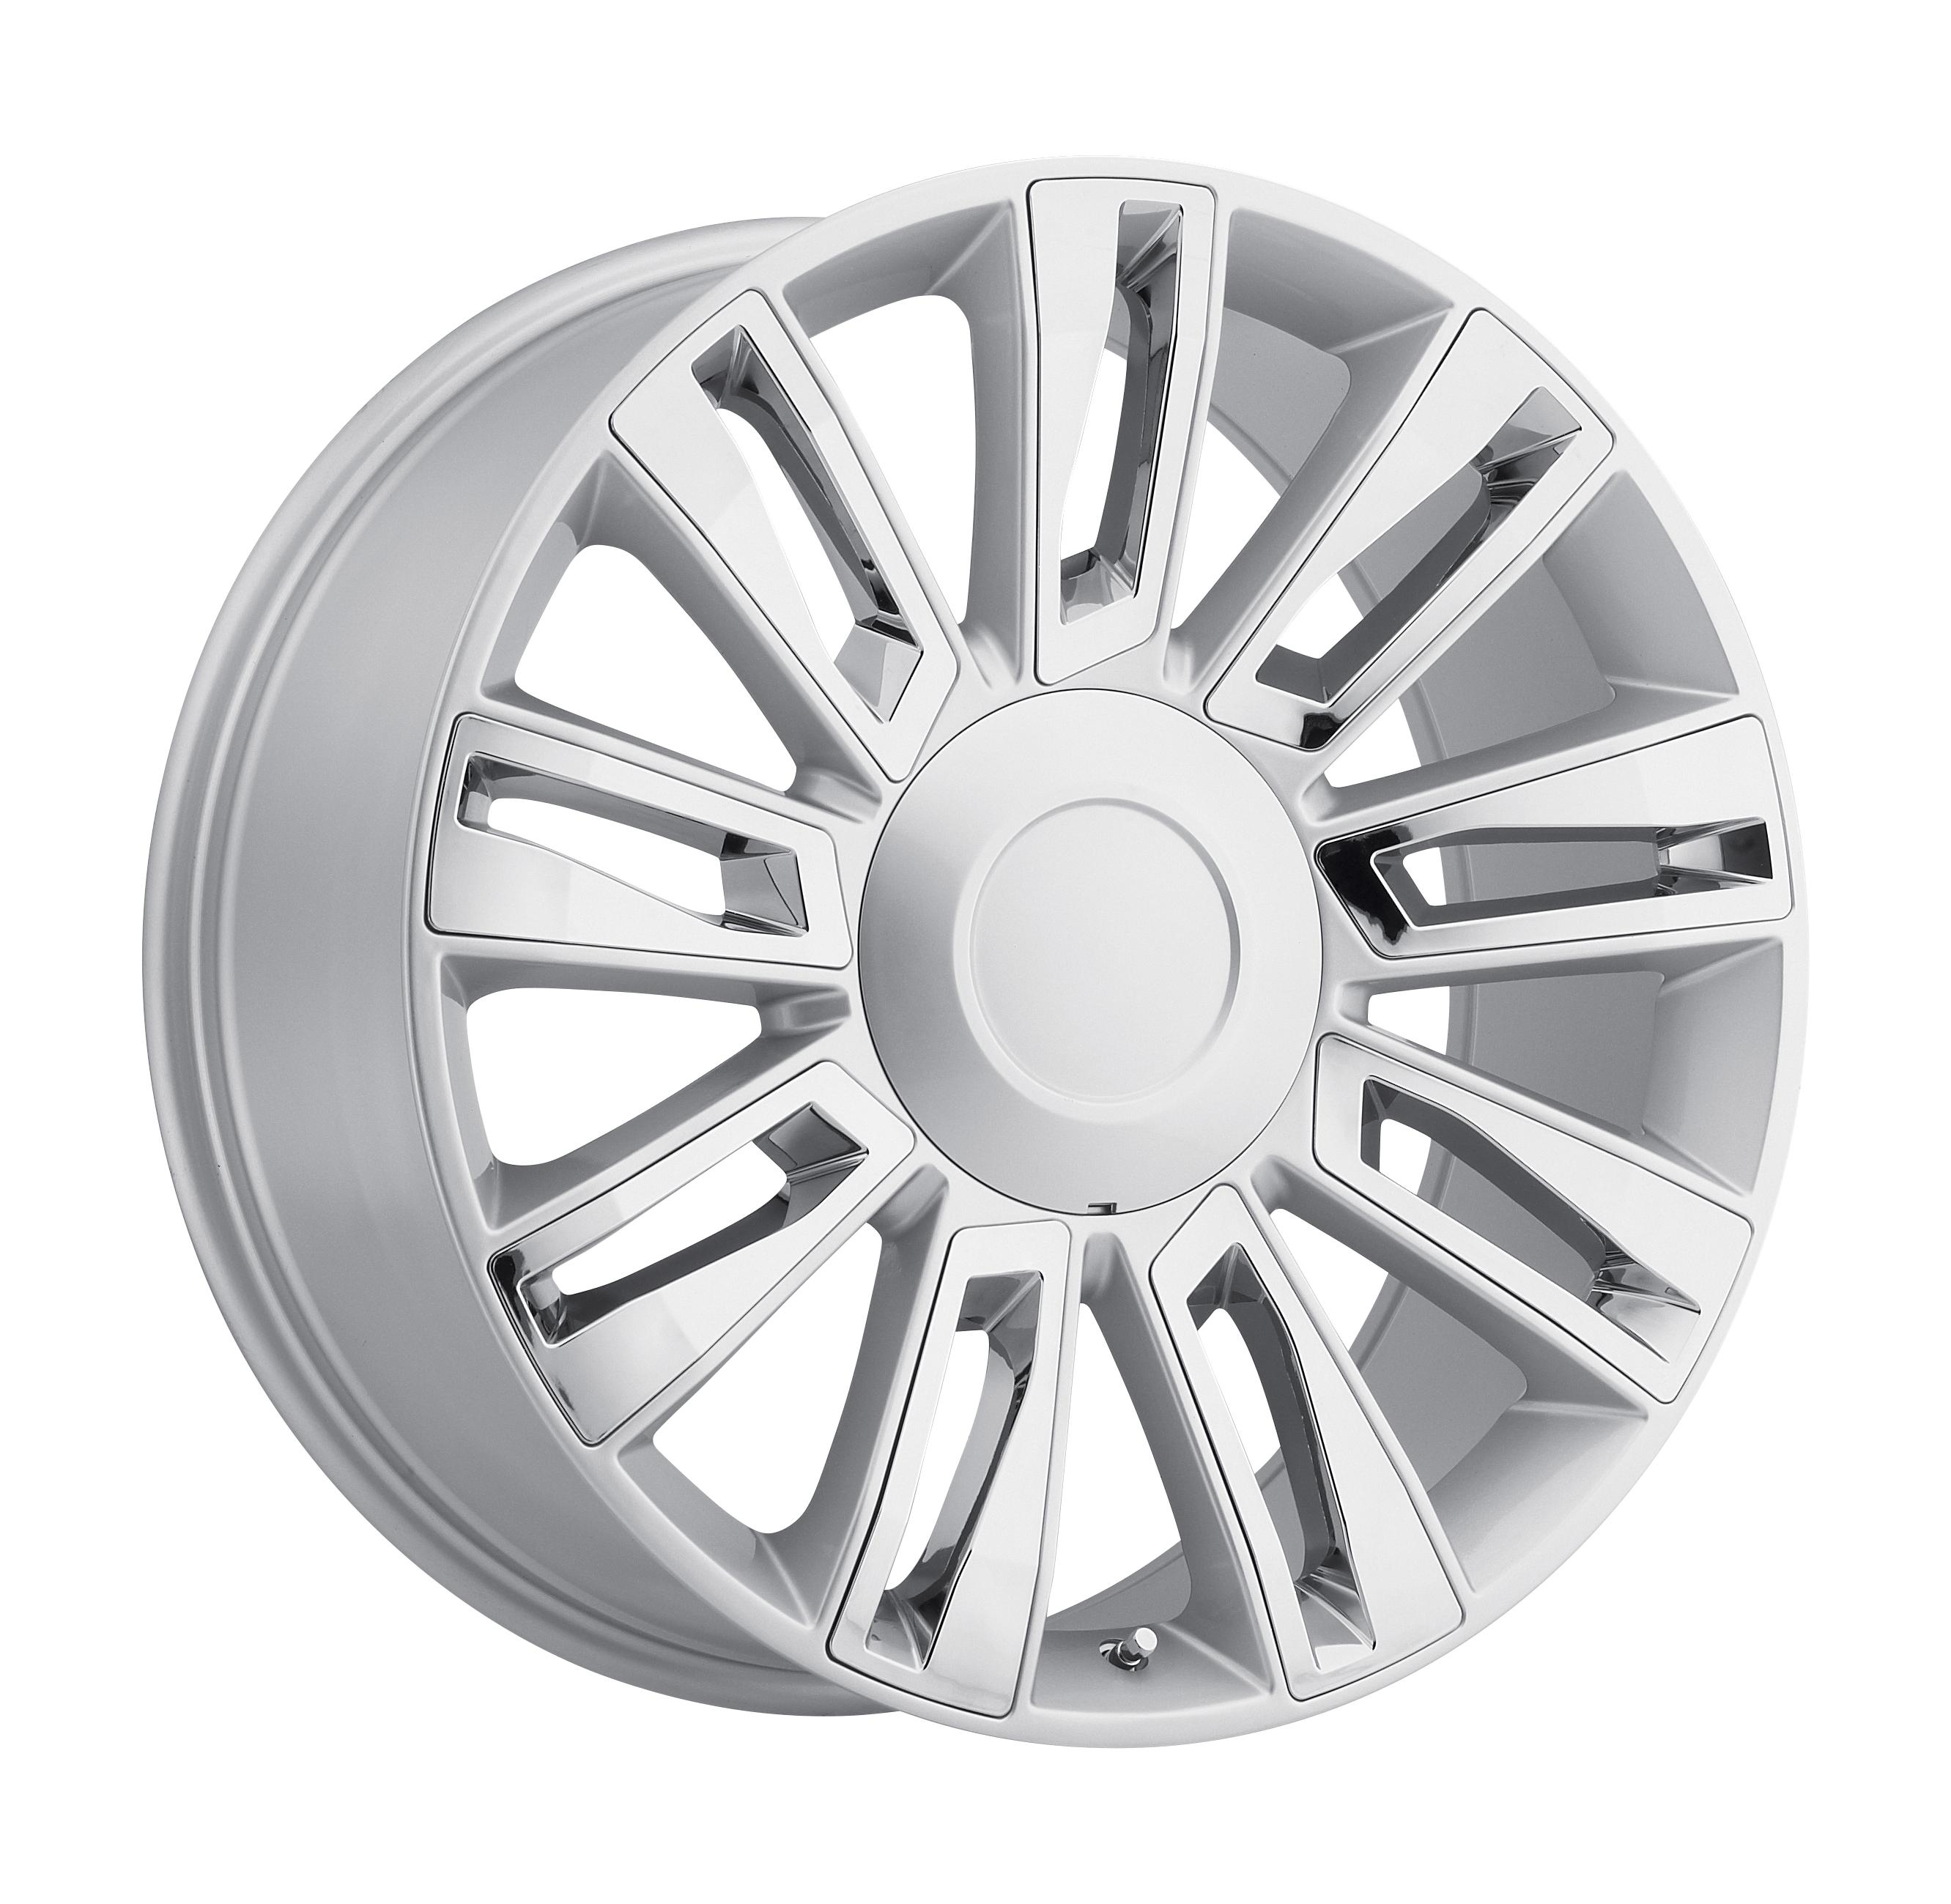 2015 Cadillac Escalade Option 3 Silver W/ Chrome Inserts